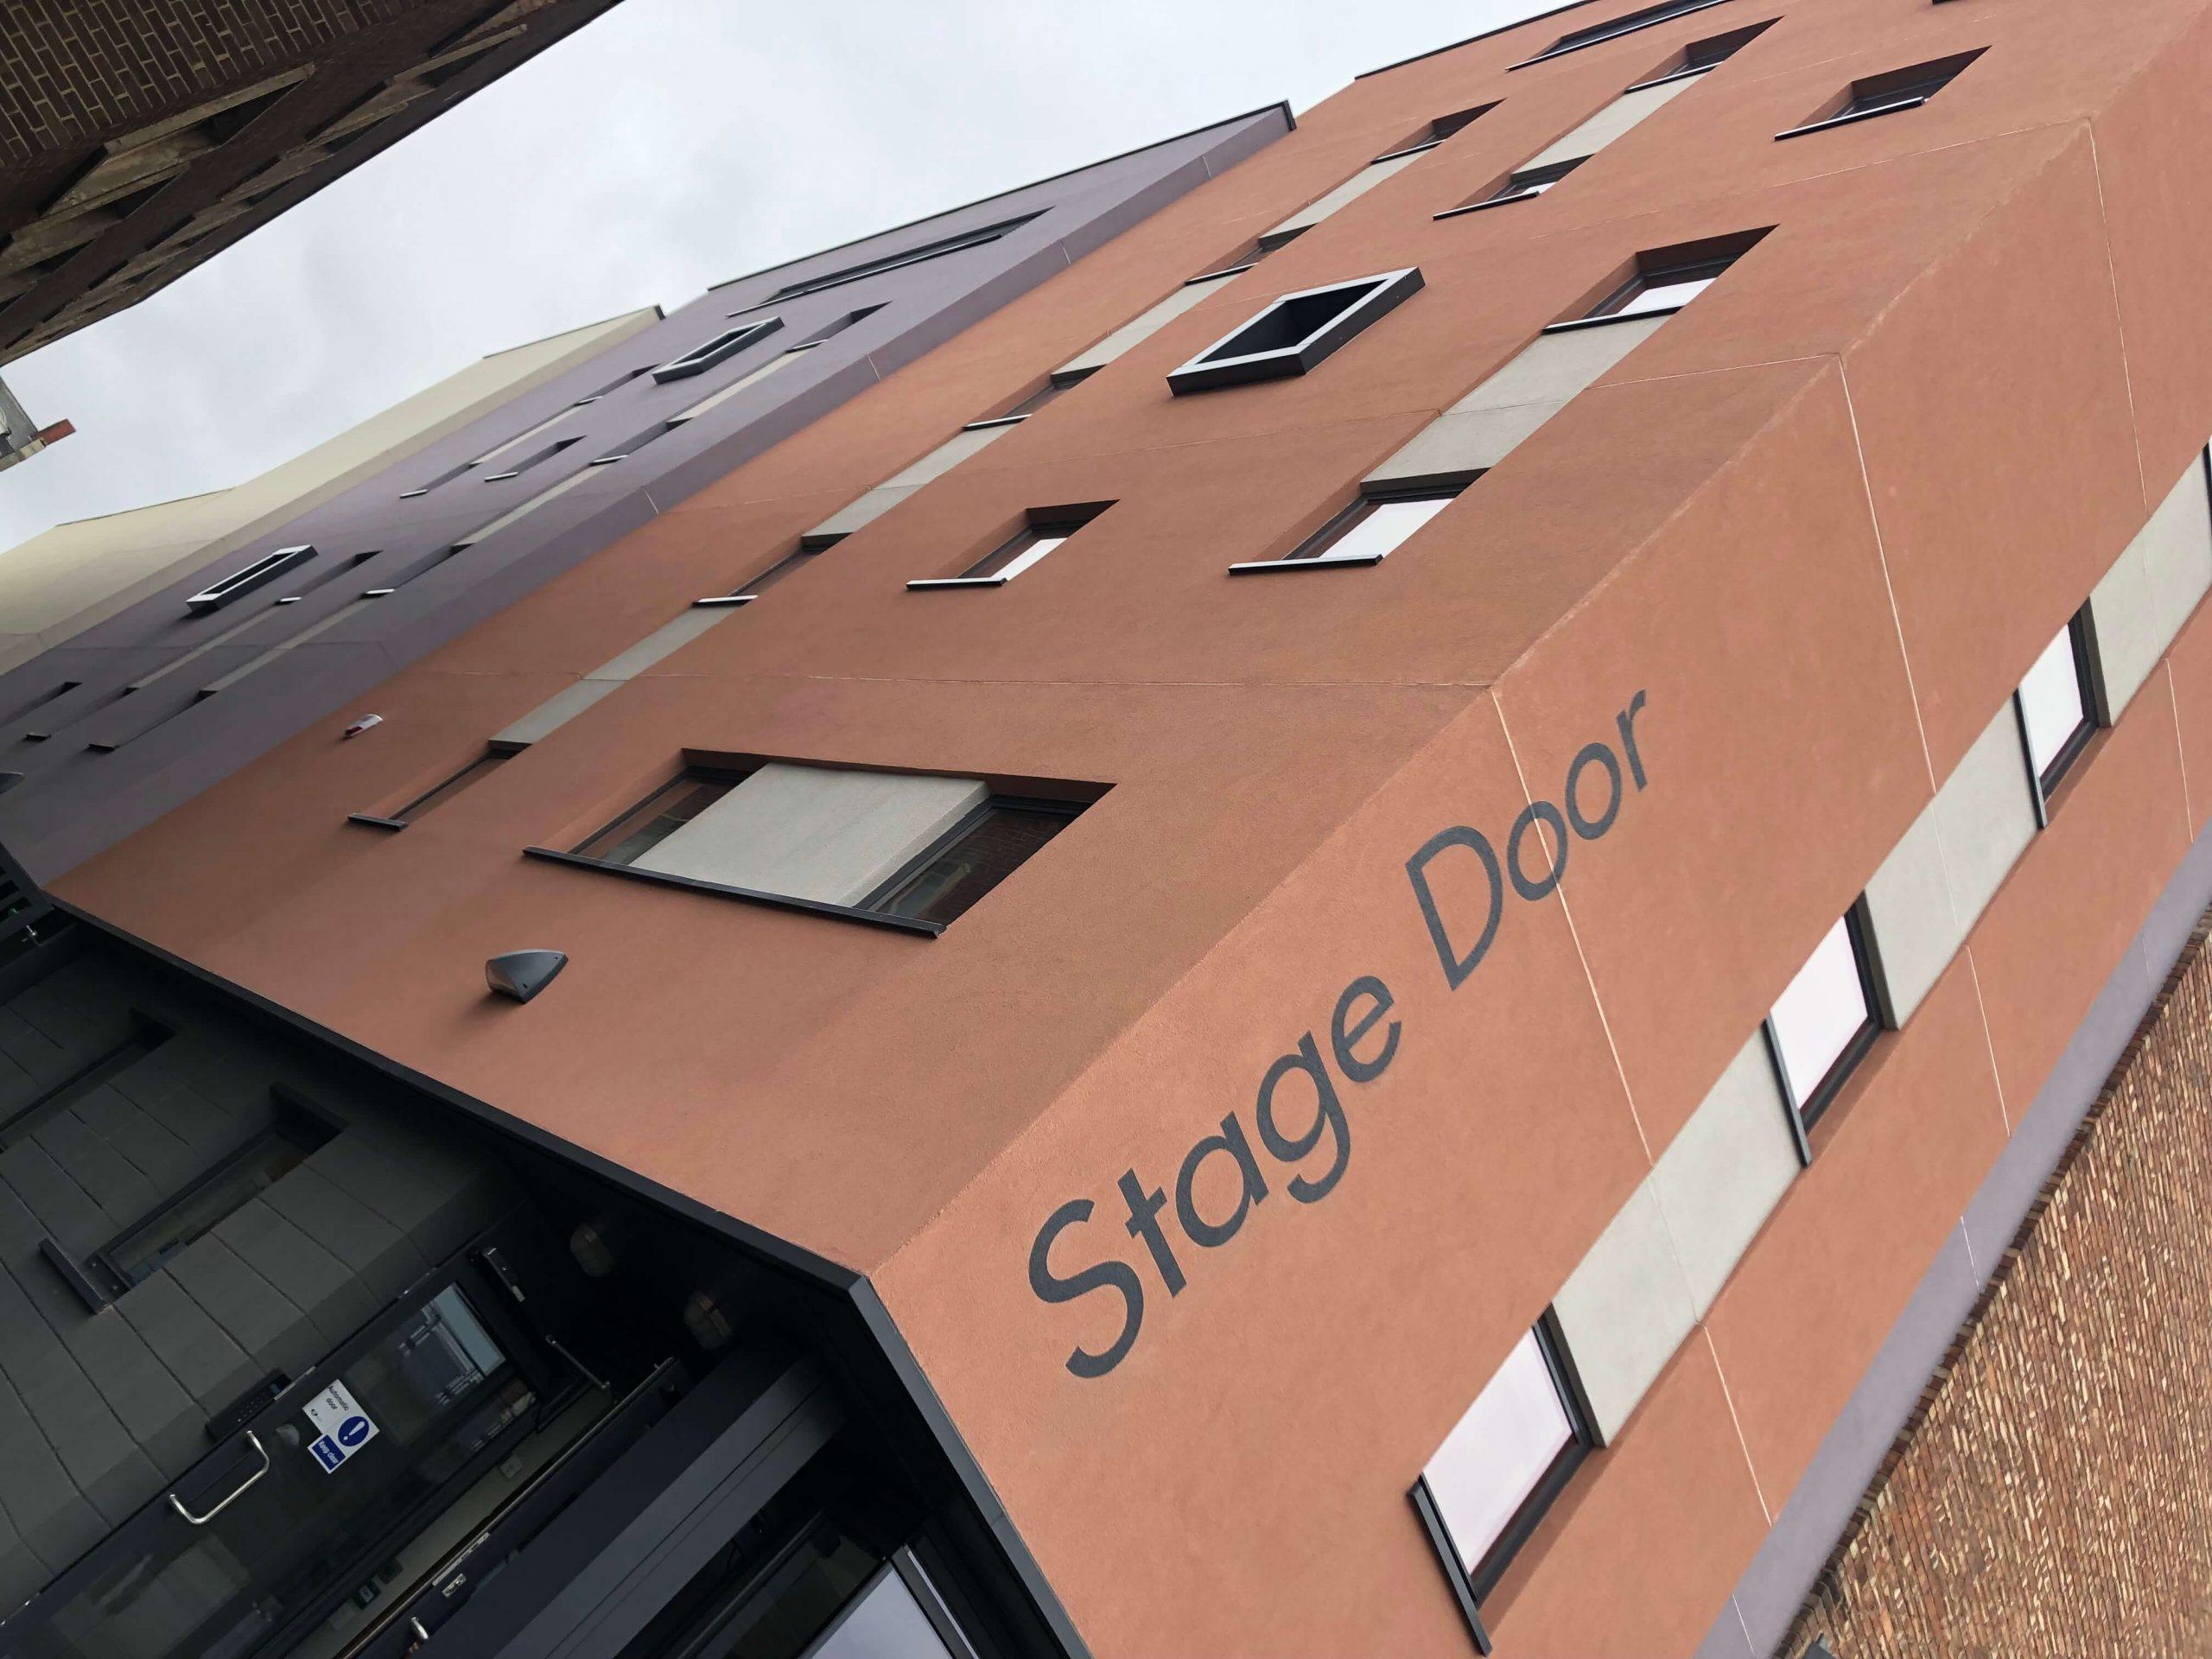 Stockton Globe stage door signage